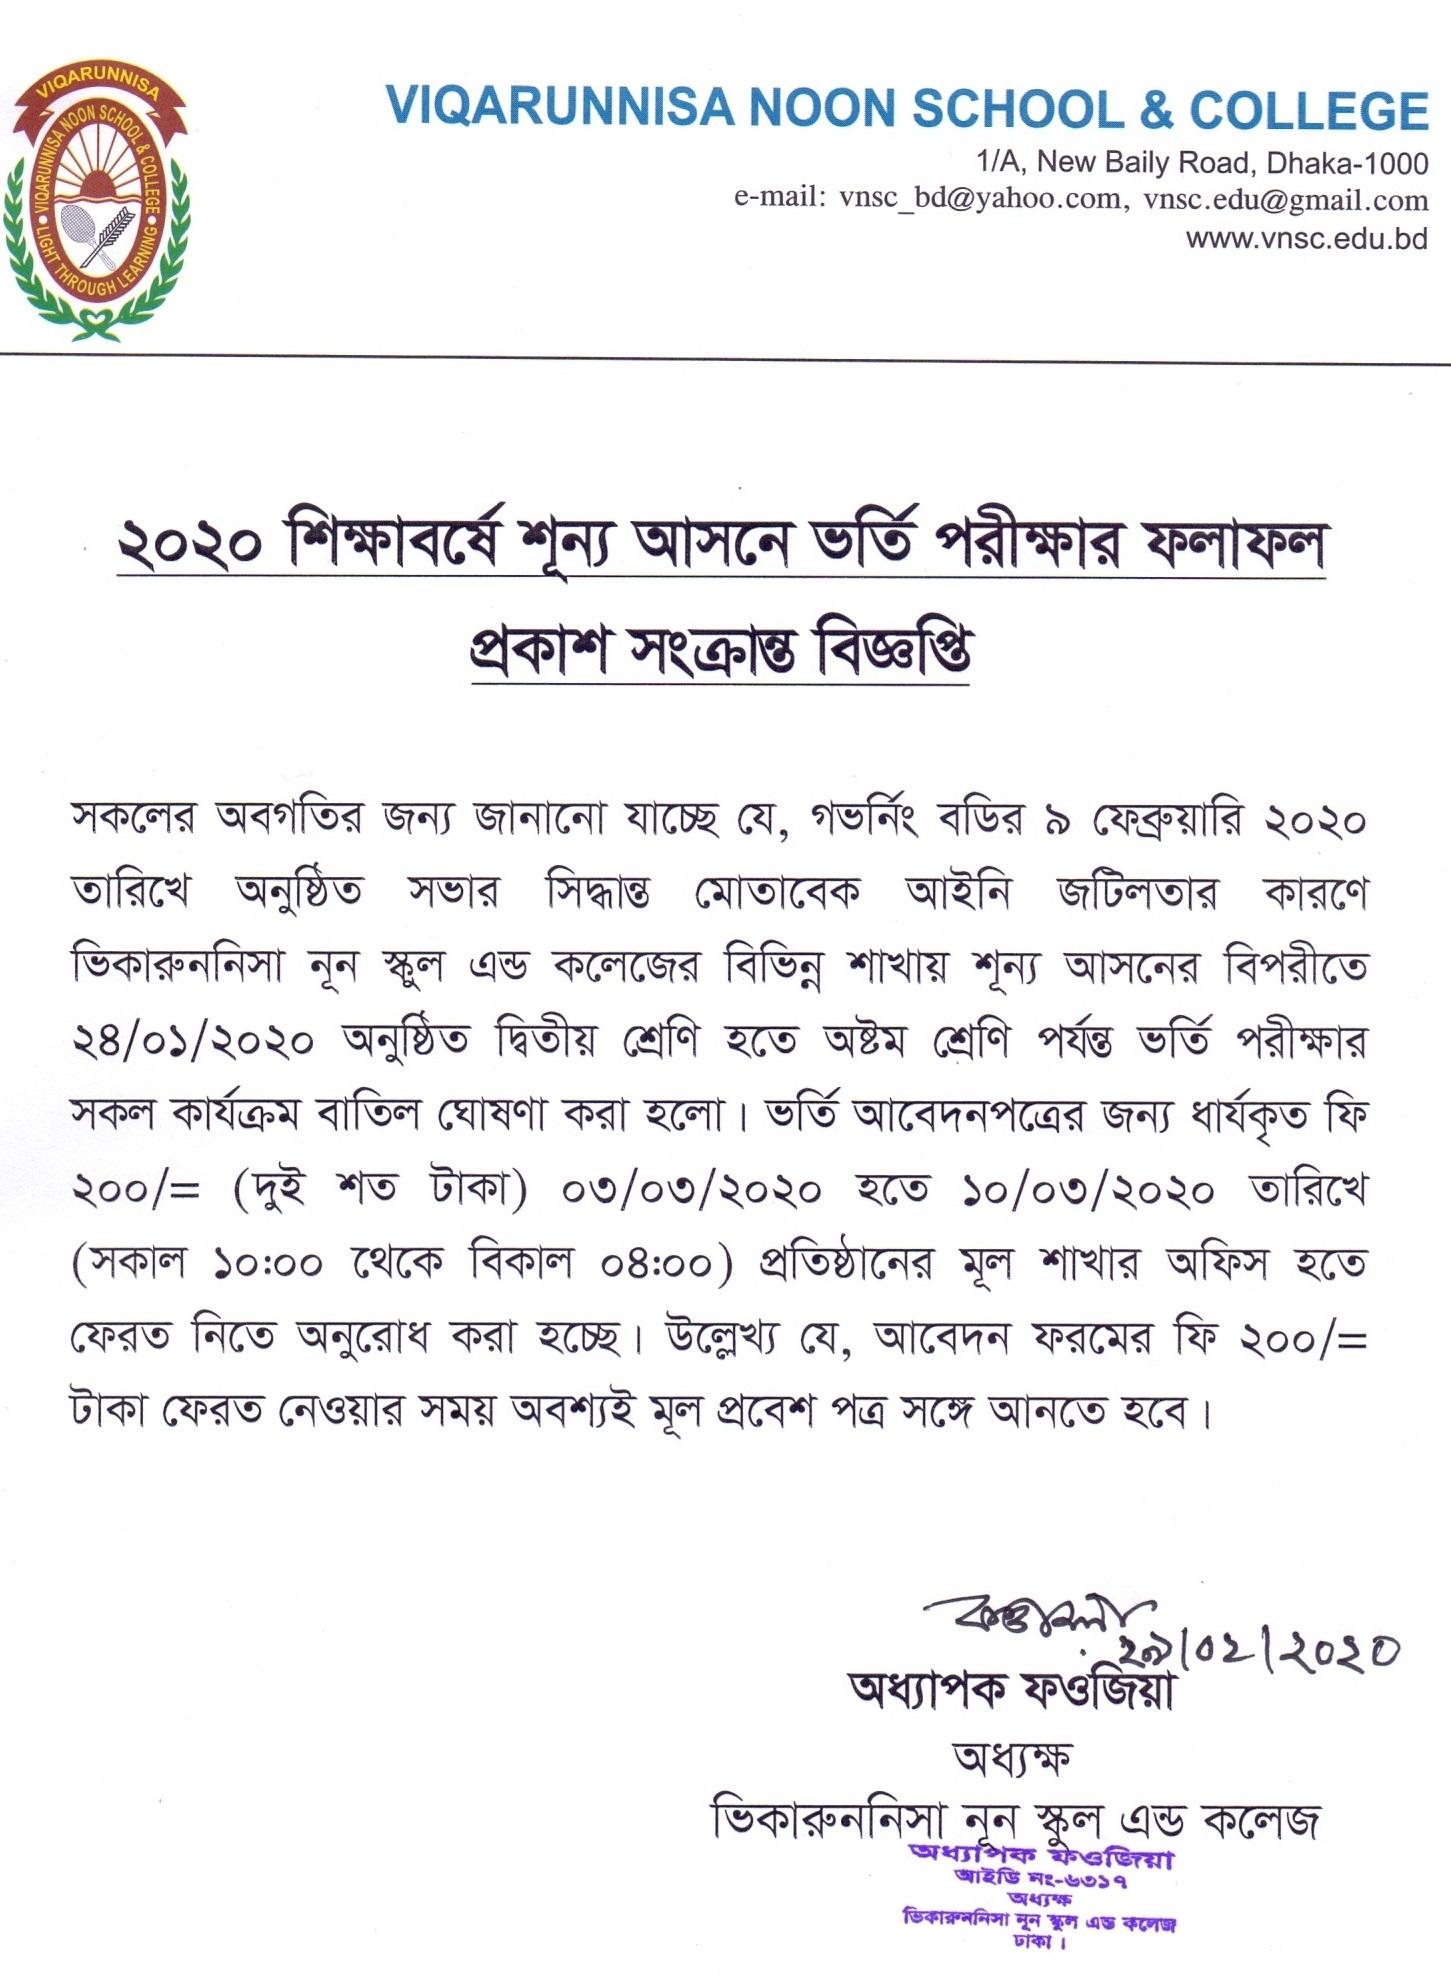 vnsc admission final notice